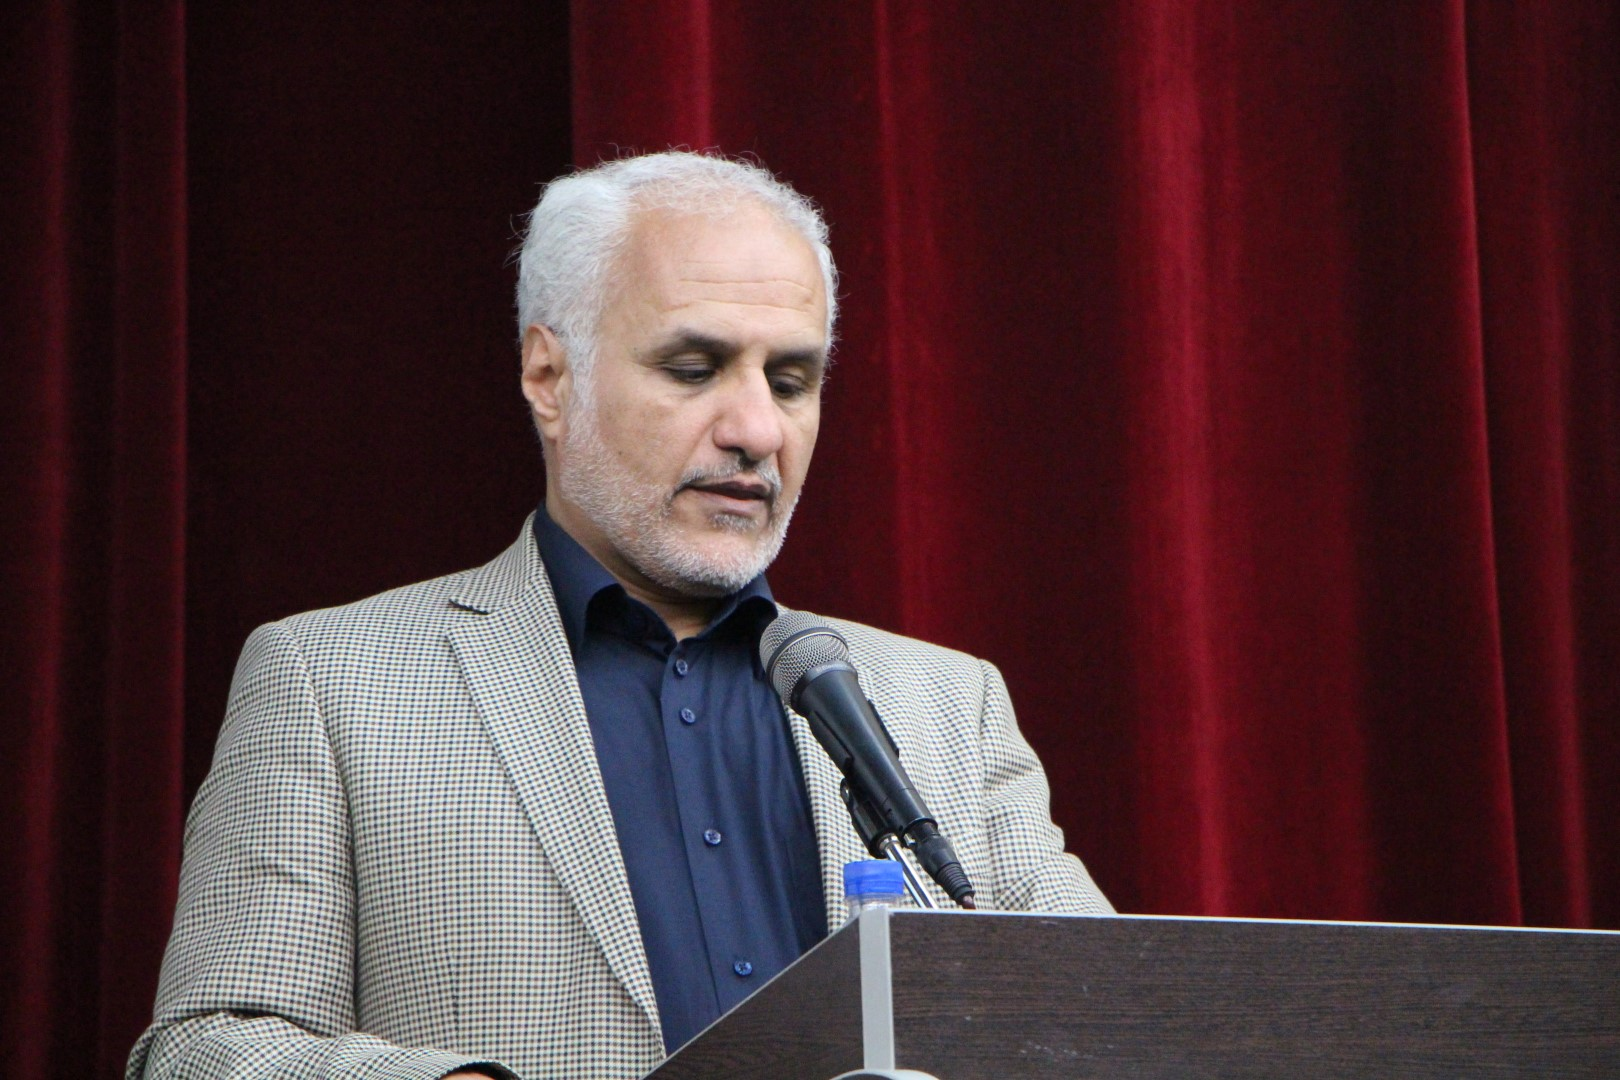 IMG 5165 گزارش تصویری؛ سخنرانی استاد حسن عباسی با موضوع از چوئن لای تا سیاست درهای باز